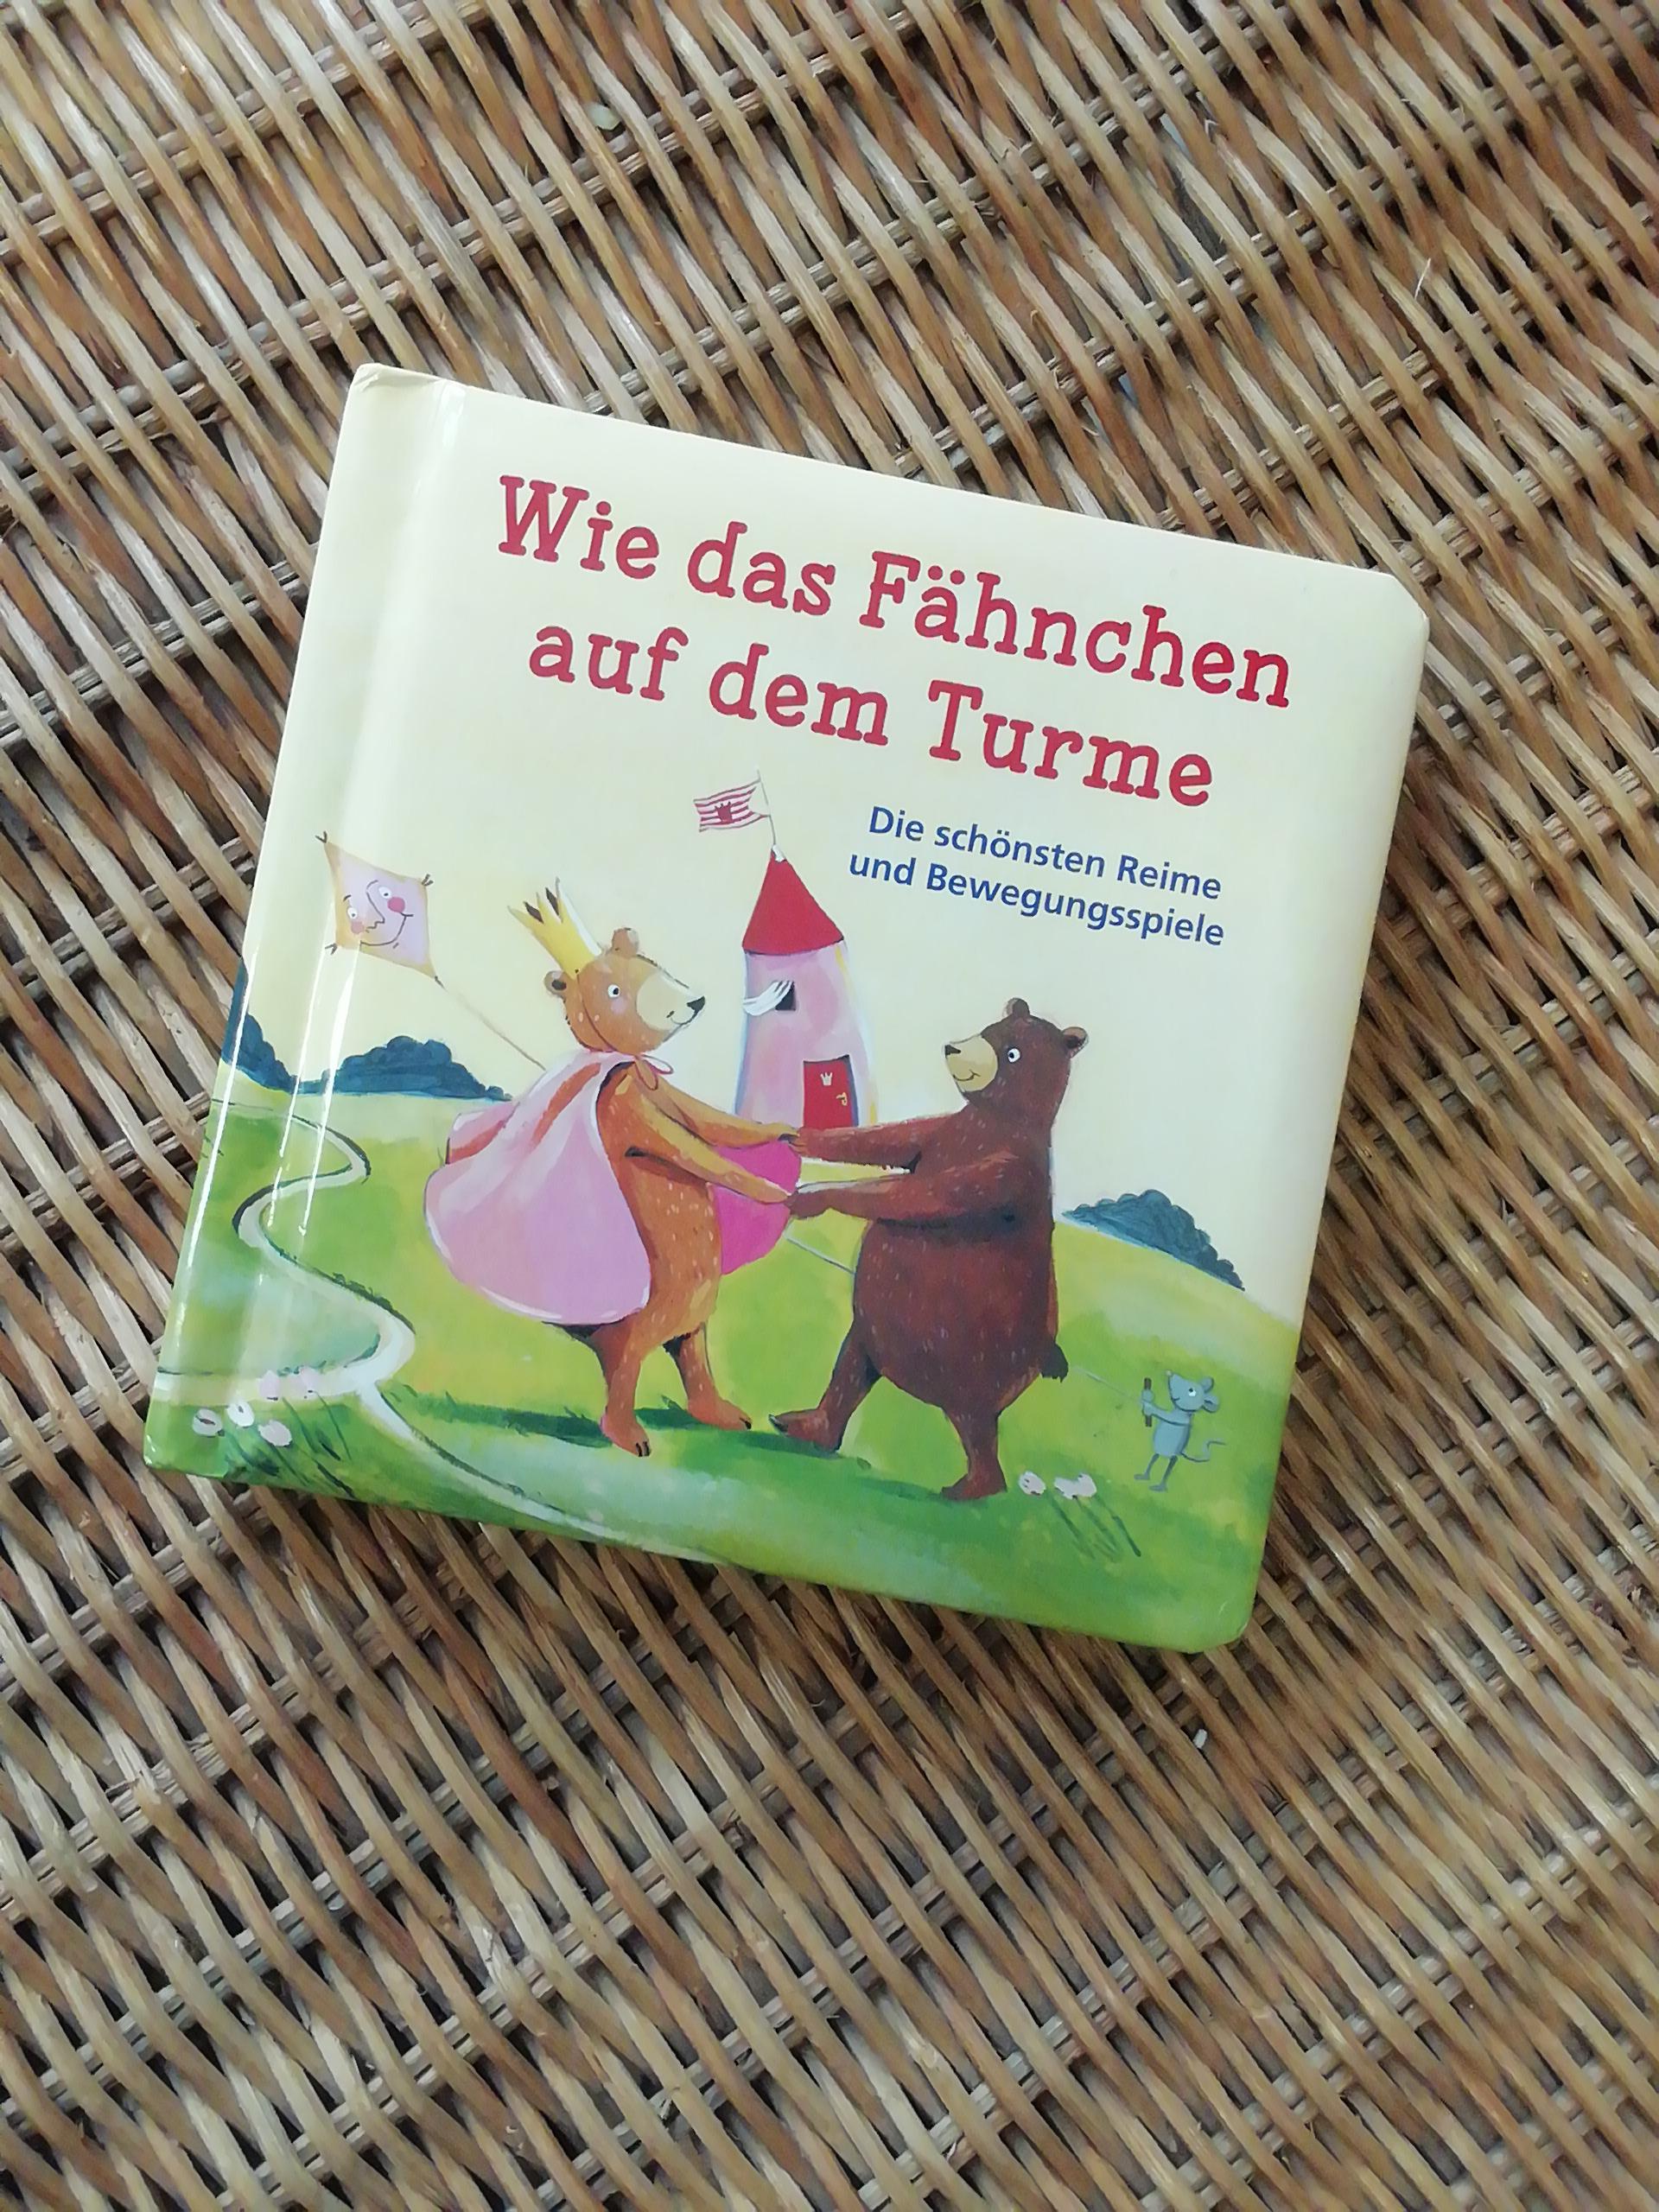 edel Lederbuch Sonne  Baumwoll Papier HANDARBEIT Tagebuch Notizbuch Wünschebuch